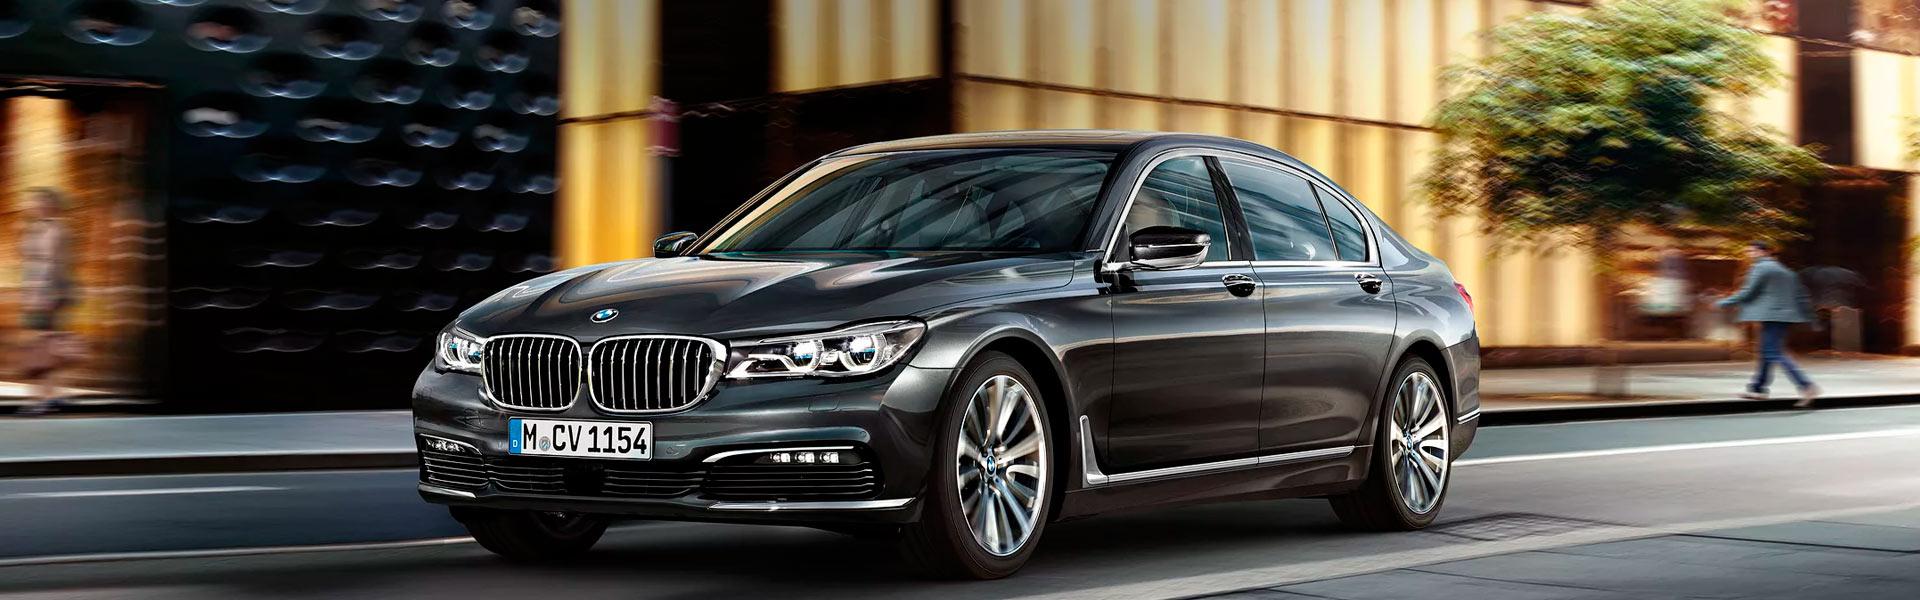 Сервис BMW 7-series